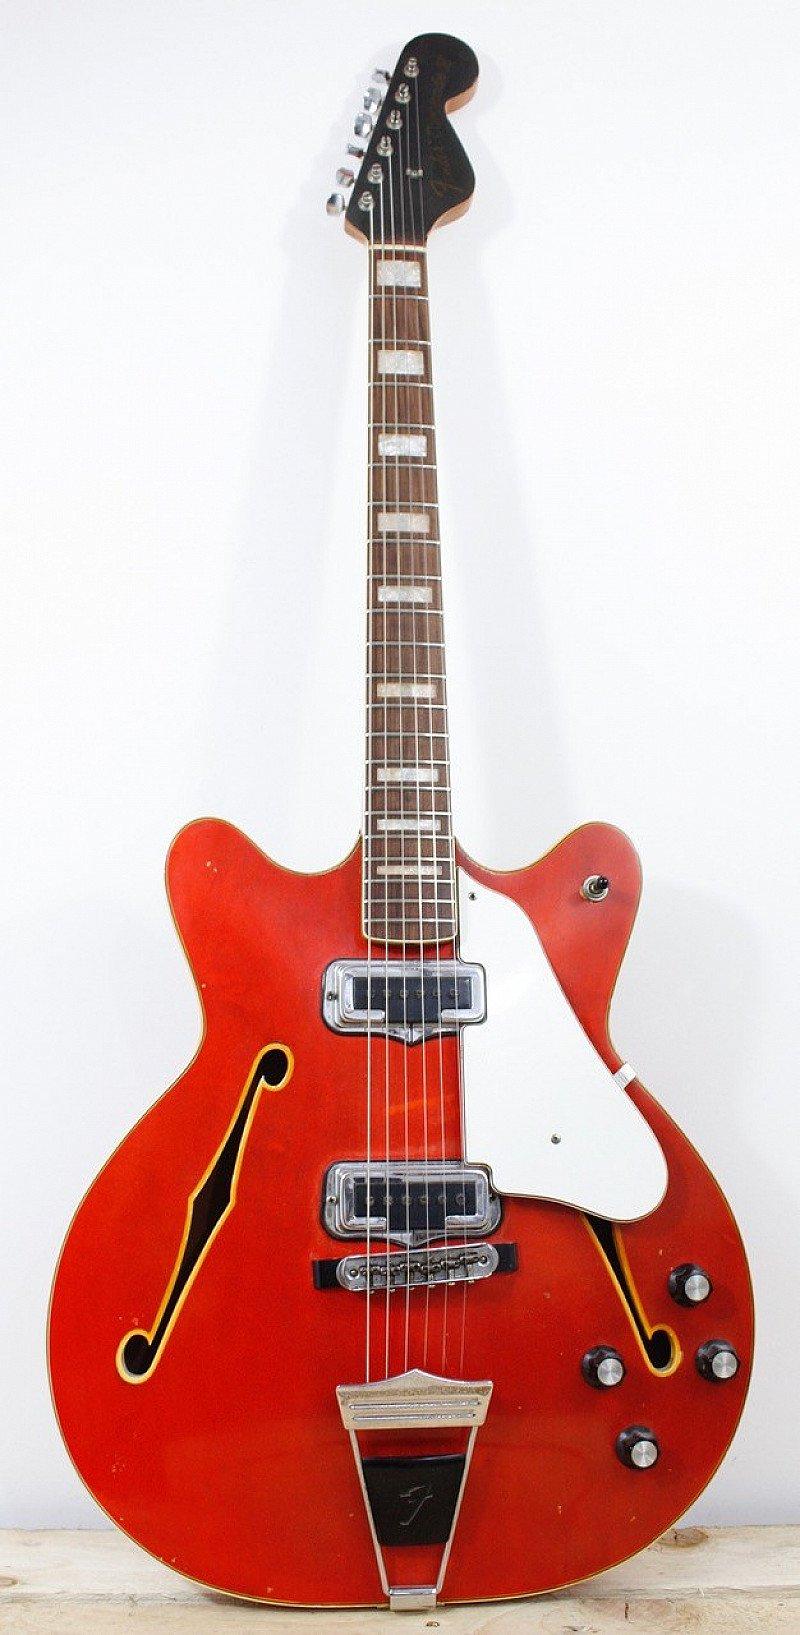 This 1967 Fender Coronado II is only £1,480